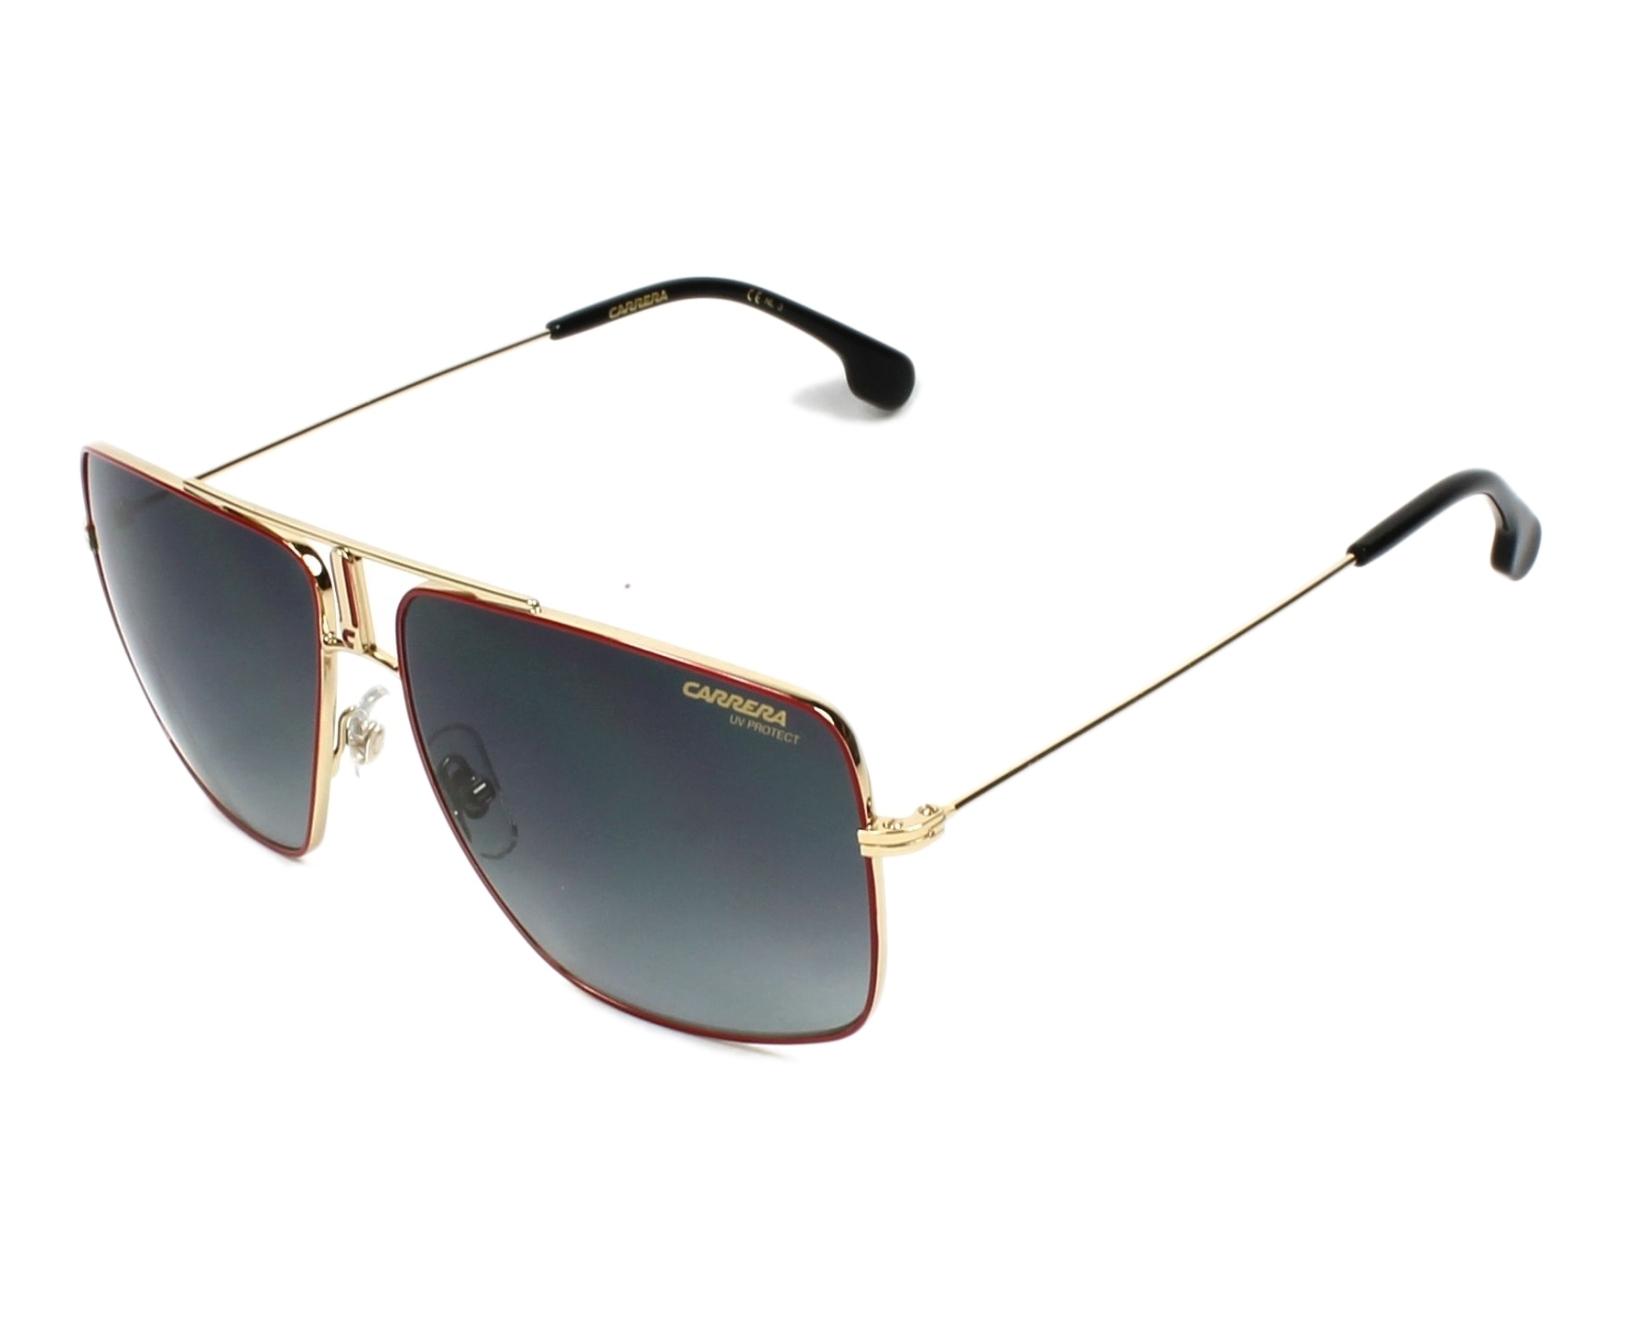 f1cd5f92bd7668 Sunglasses Carrera 1006-S AU2 90 - Red Gold profile view